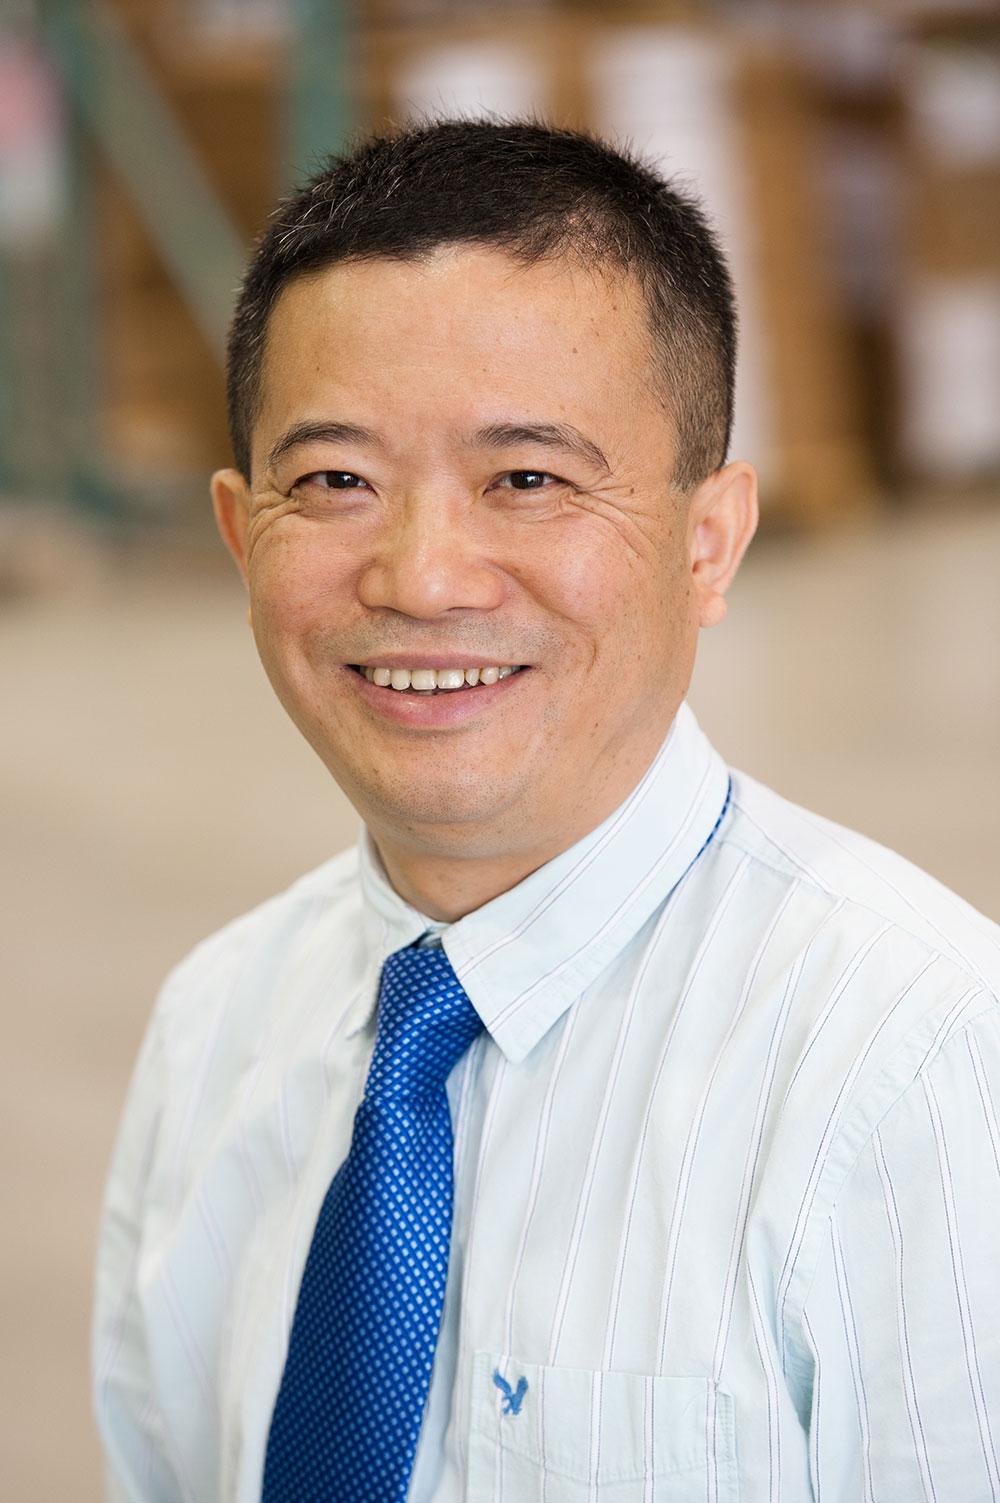 Marketing Kitchen direct mail expert Qian Ren